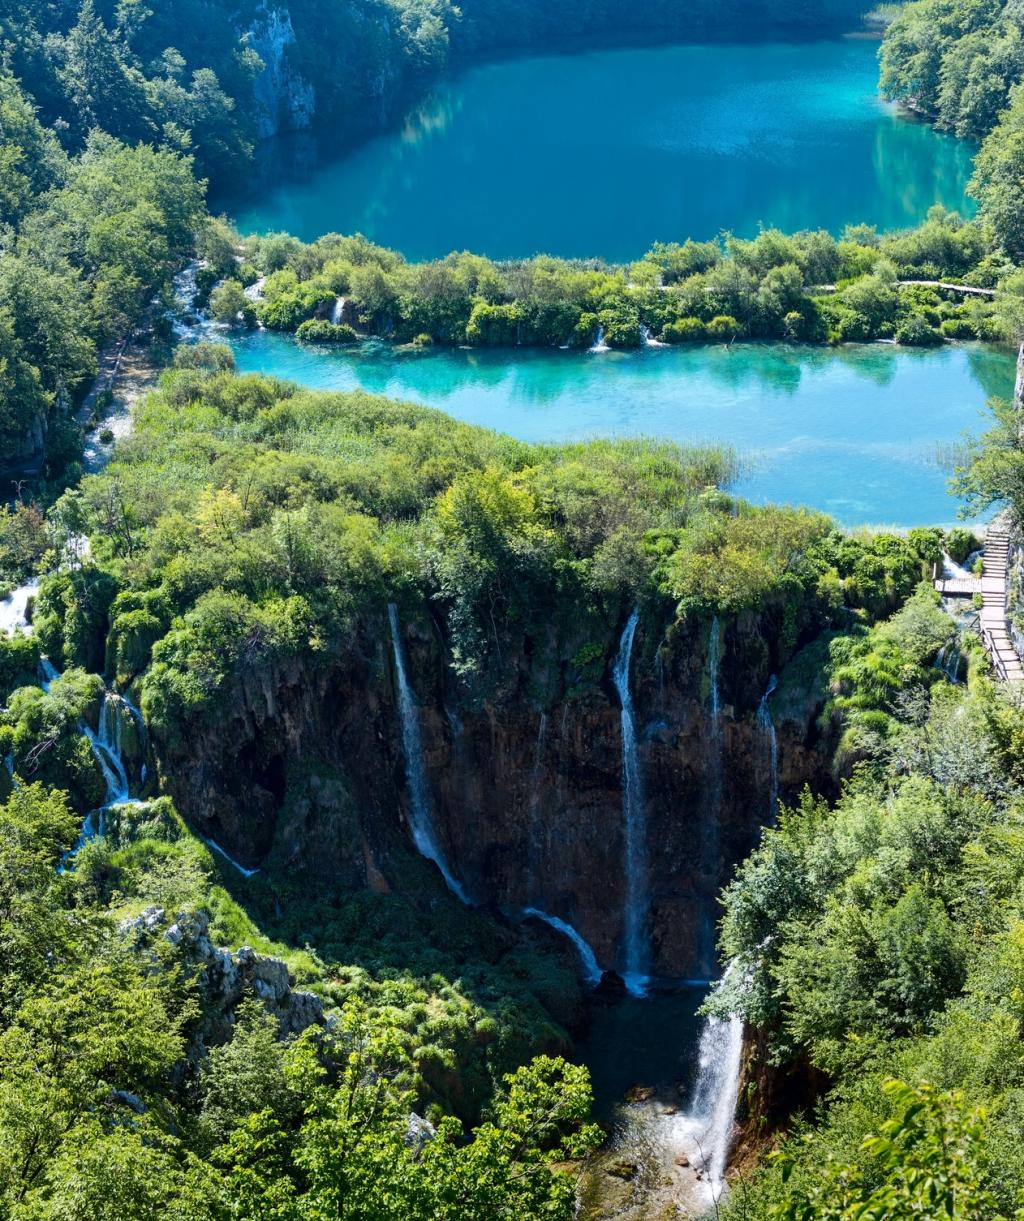 Camping Plitvice: Bestofcroatia.eu Travel Guide